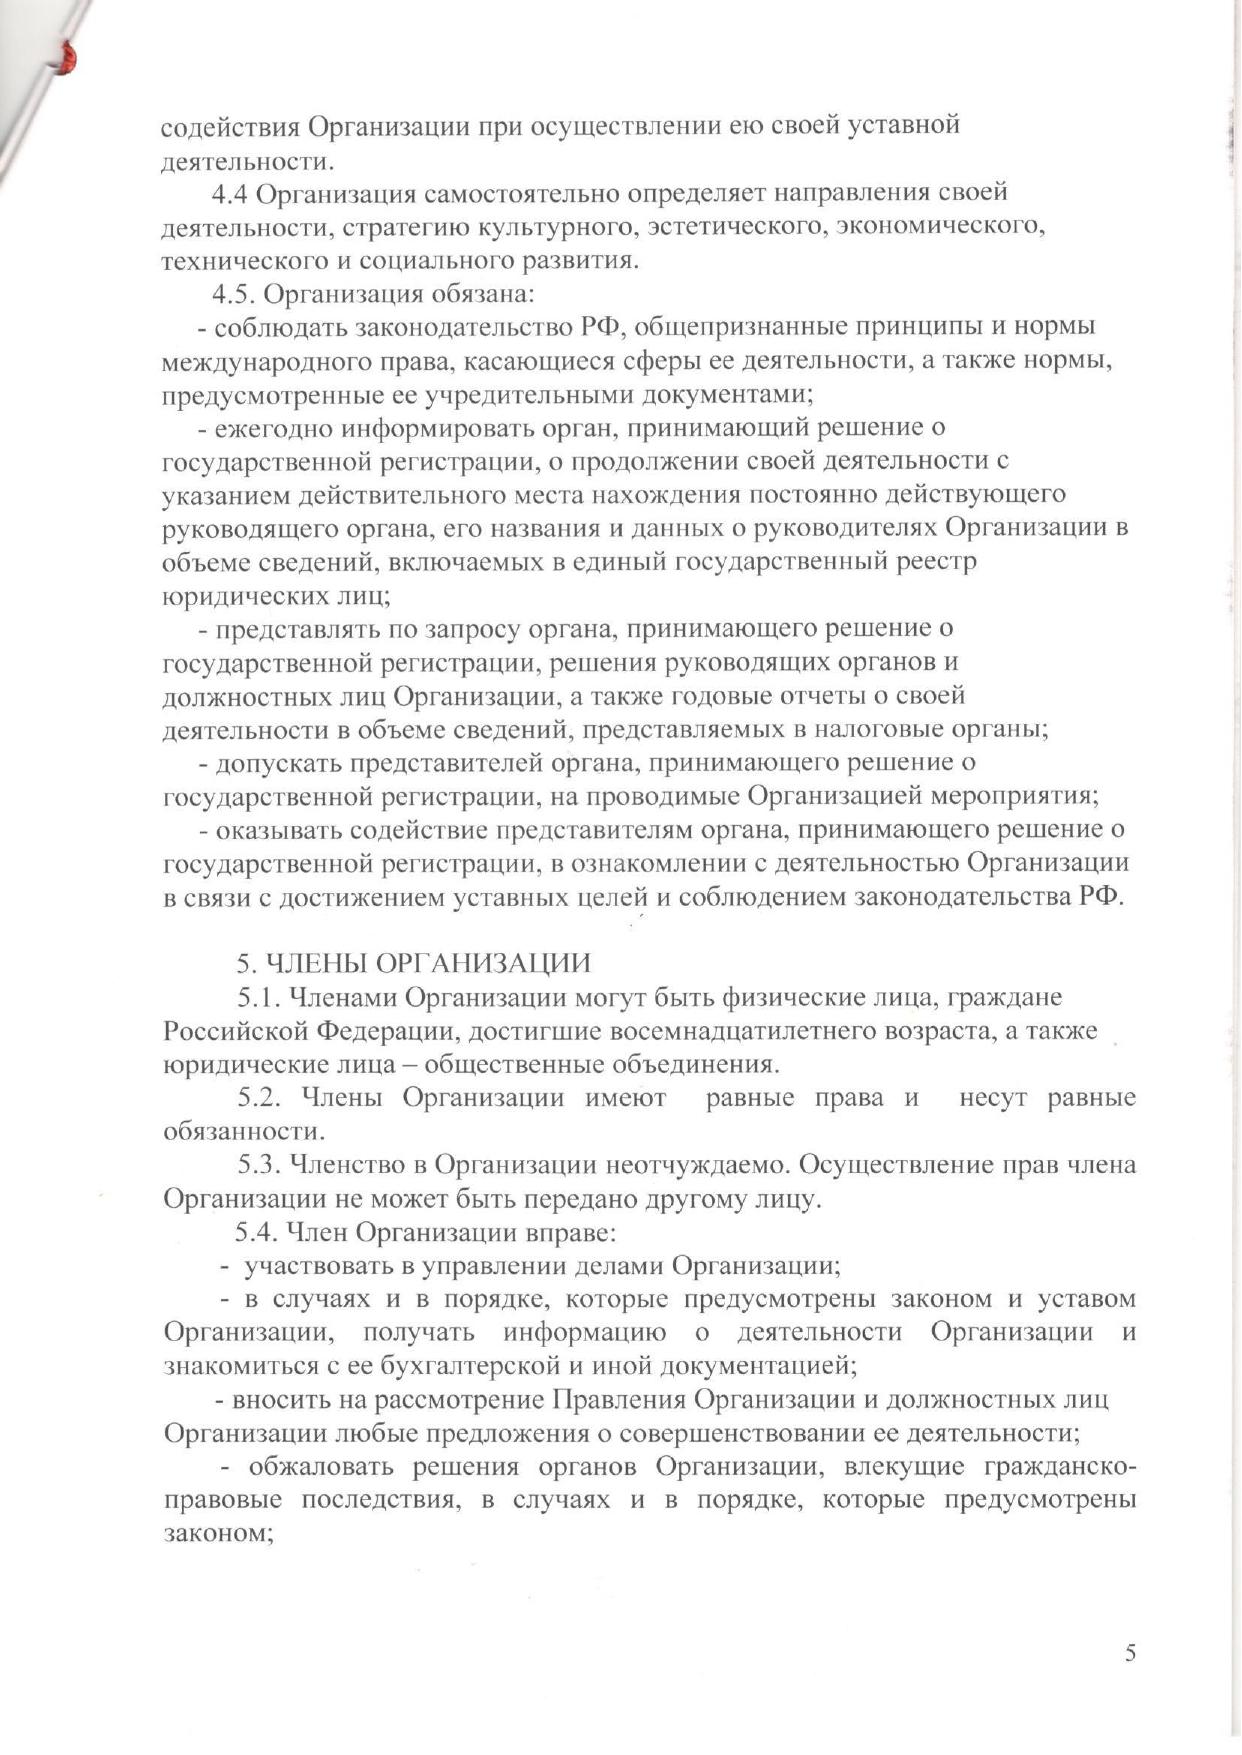 Устав_pages-to-jpg-0005